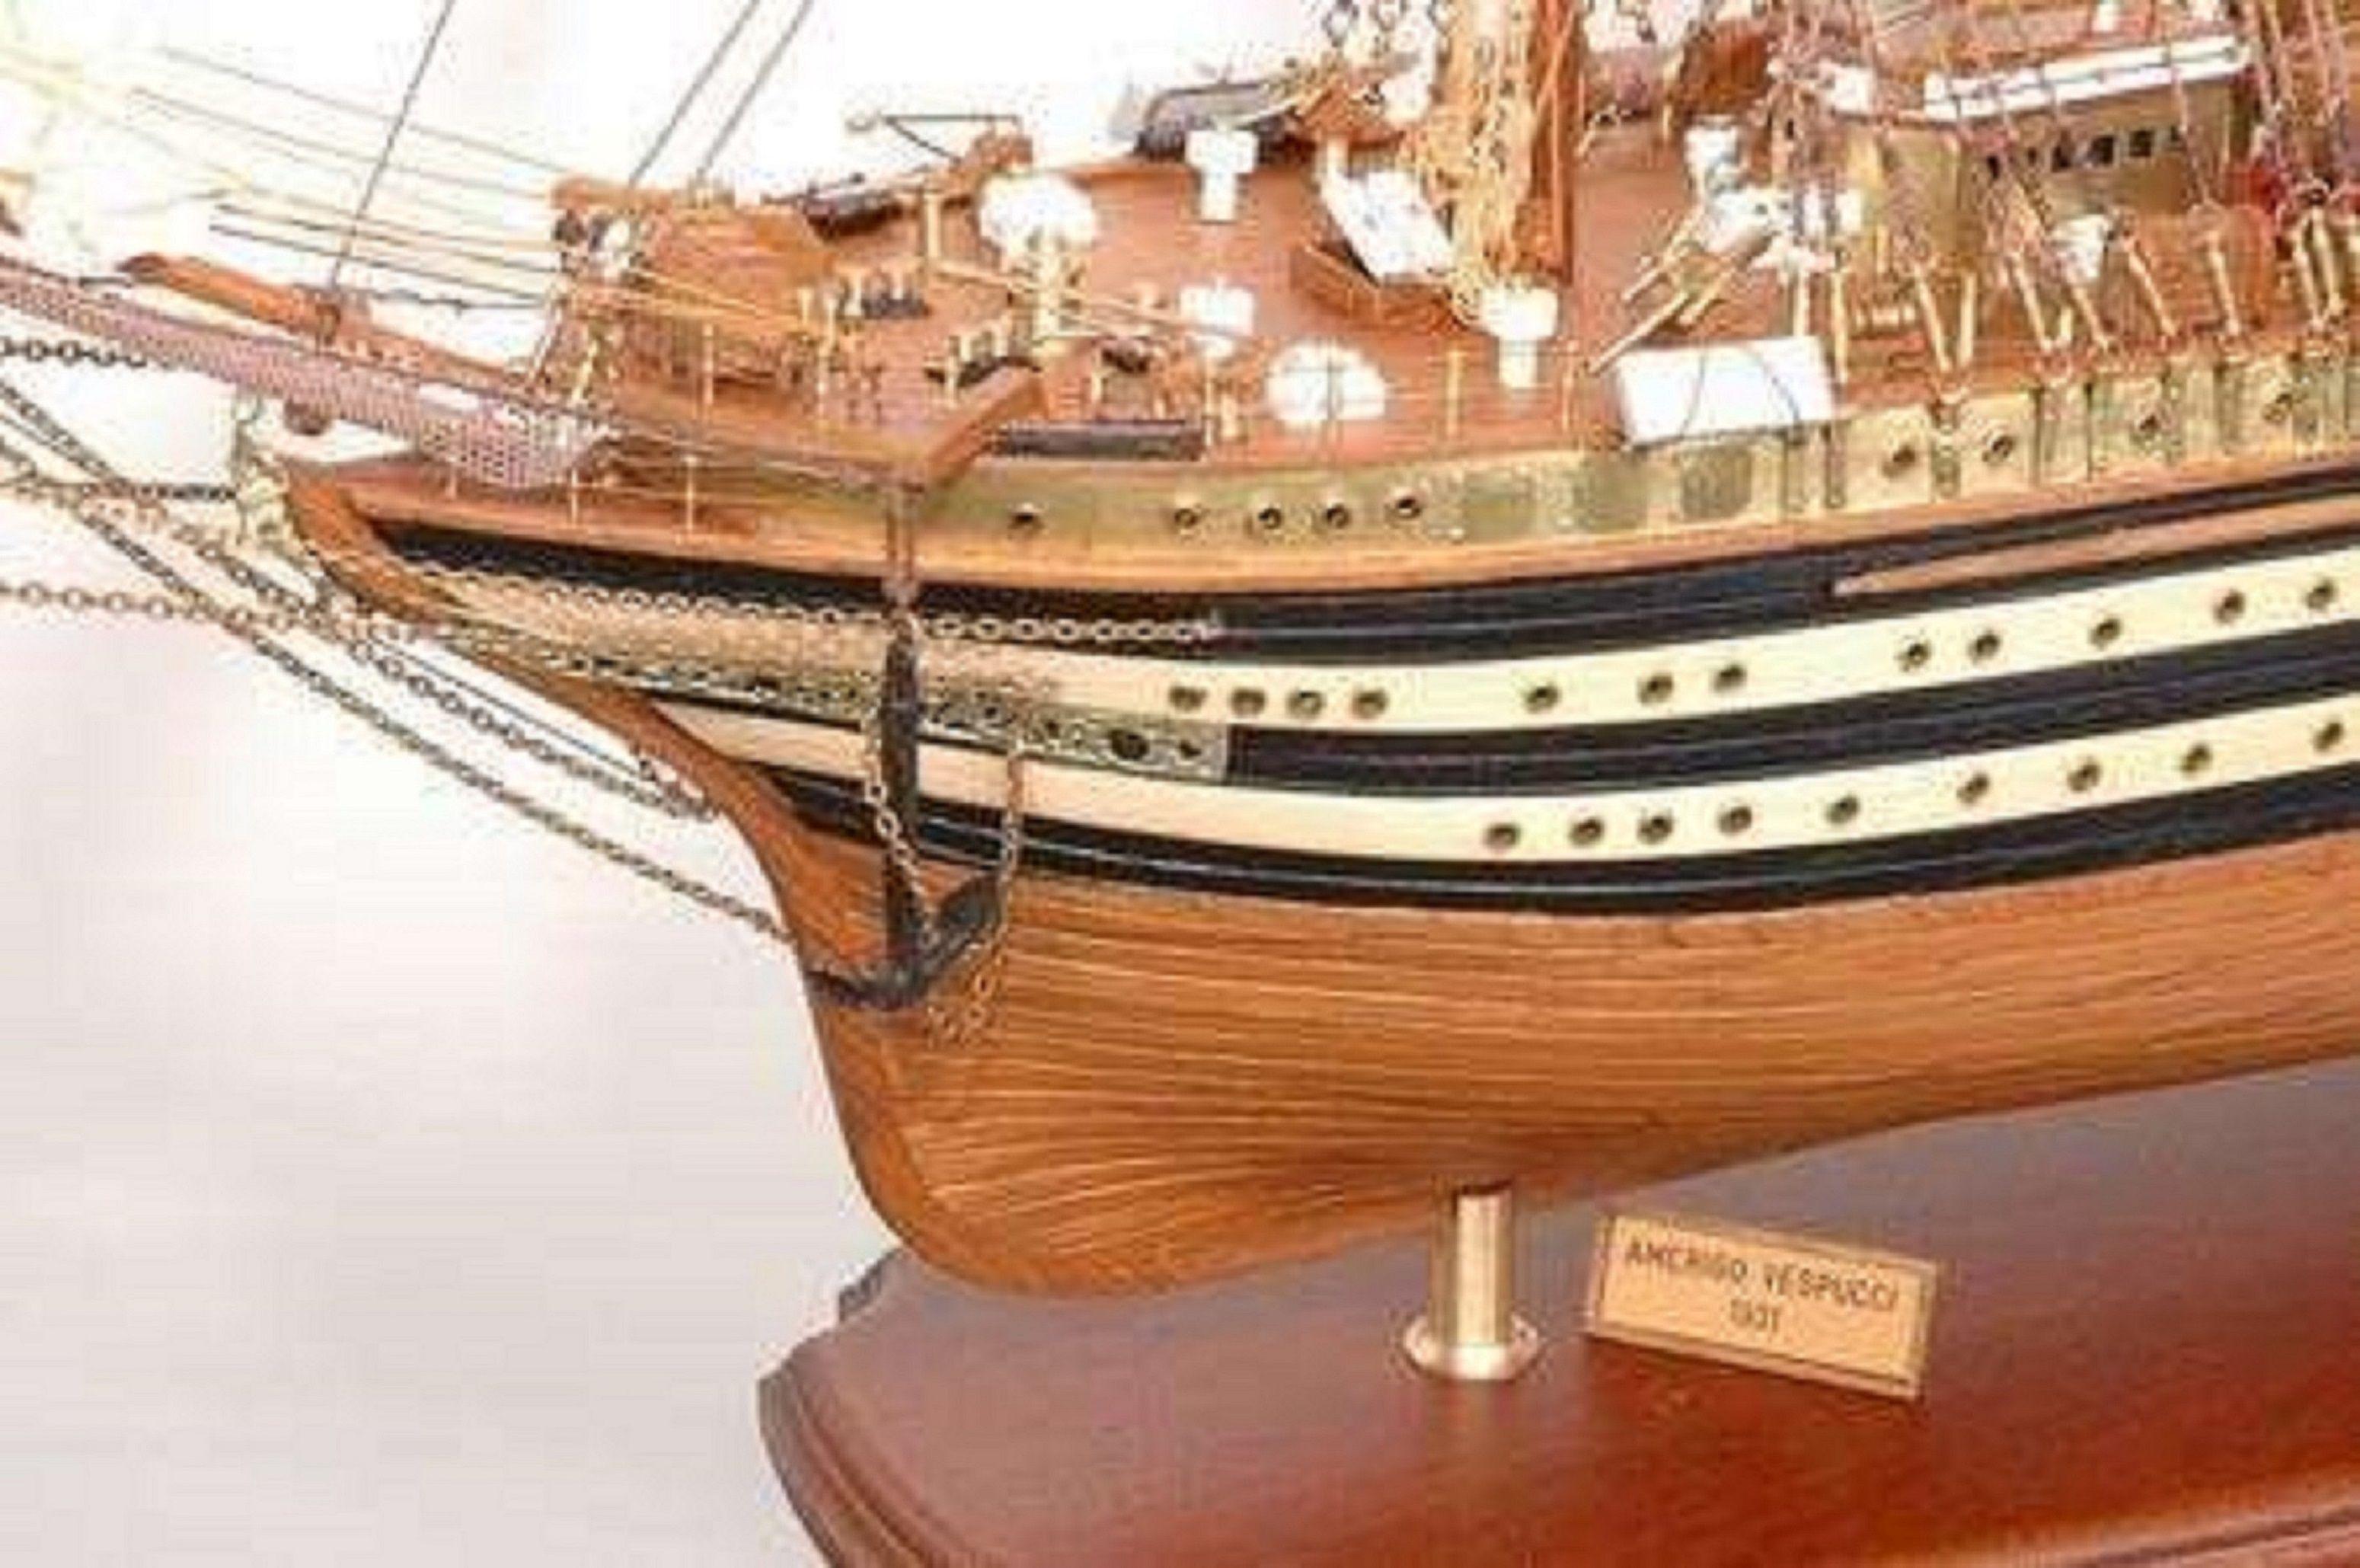 498-7771-Amerigo-Vespucci-Model-Ship-Superior-Range